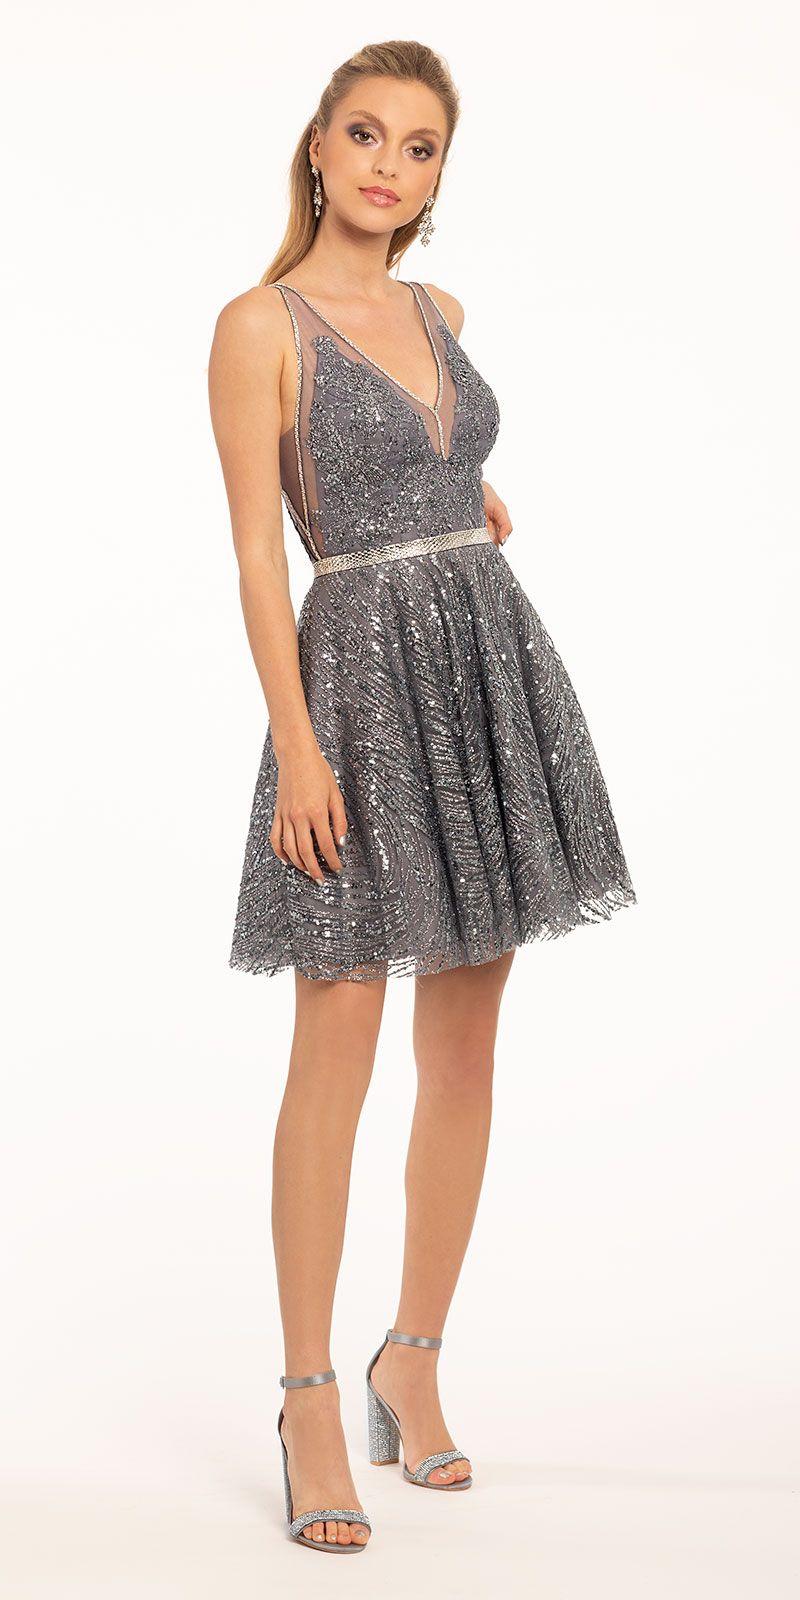 Short Stone Illusion Plunge Glitter Dress Short Cocktail Dress Chic Cocktail Dress Cocktail Dress Lace [ 1600 x 800 Pixel ]